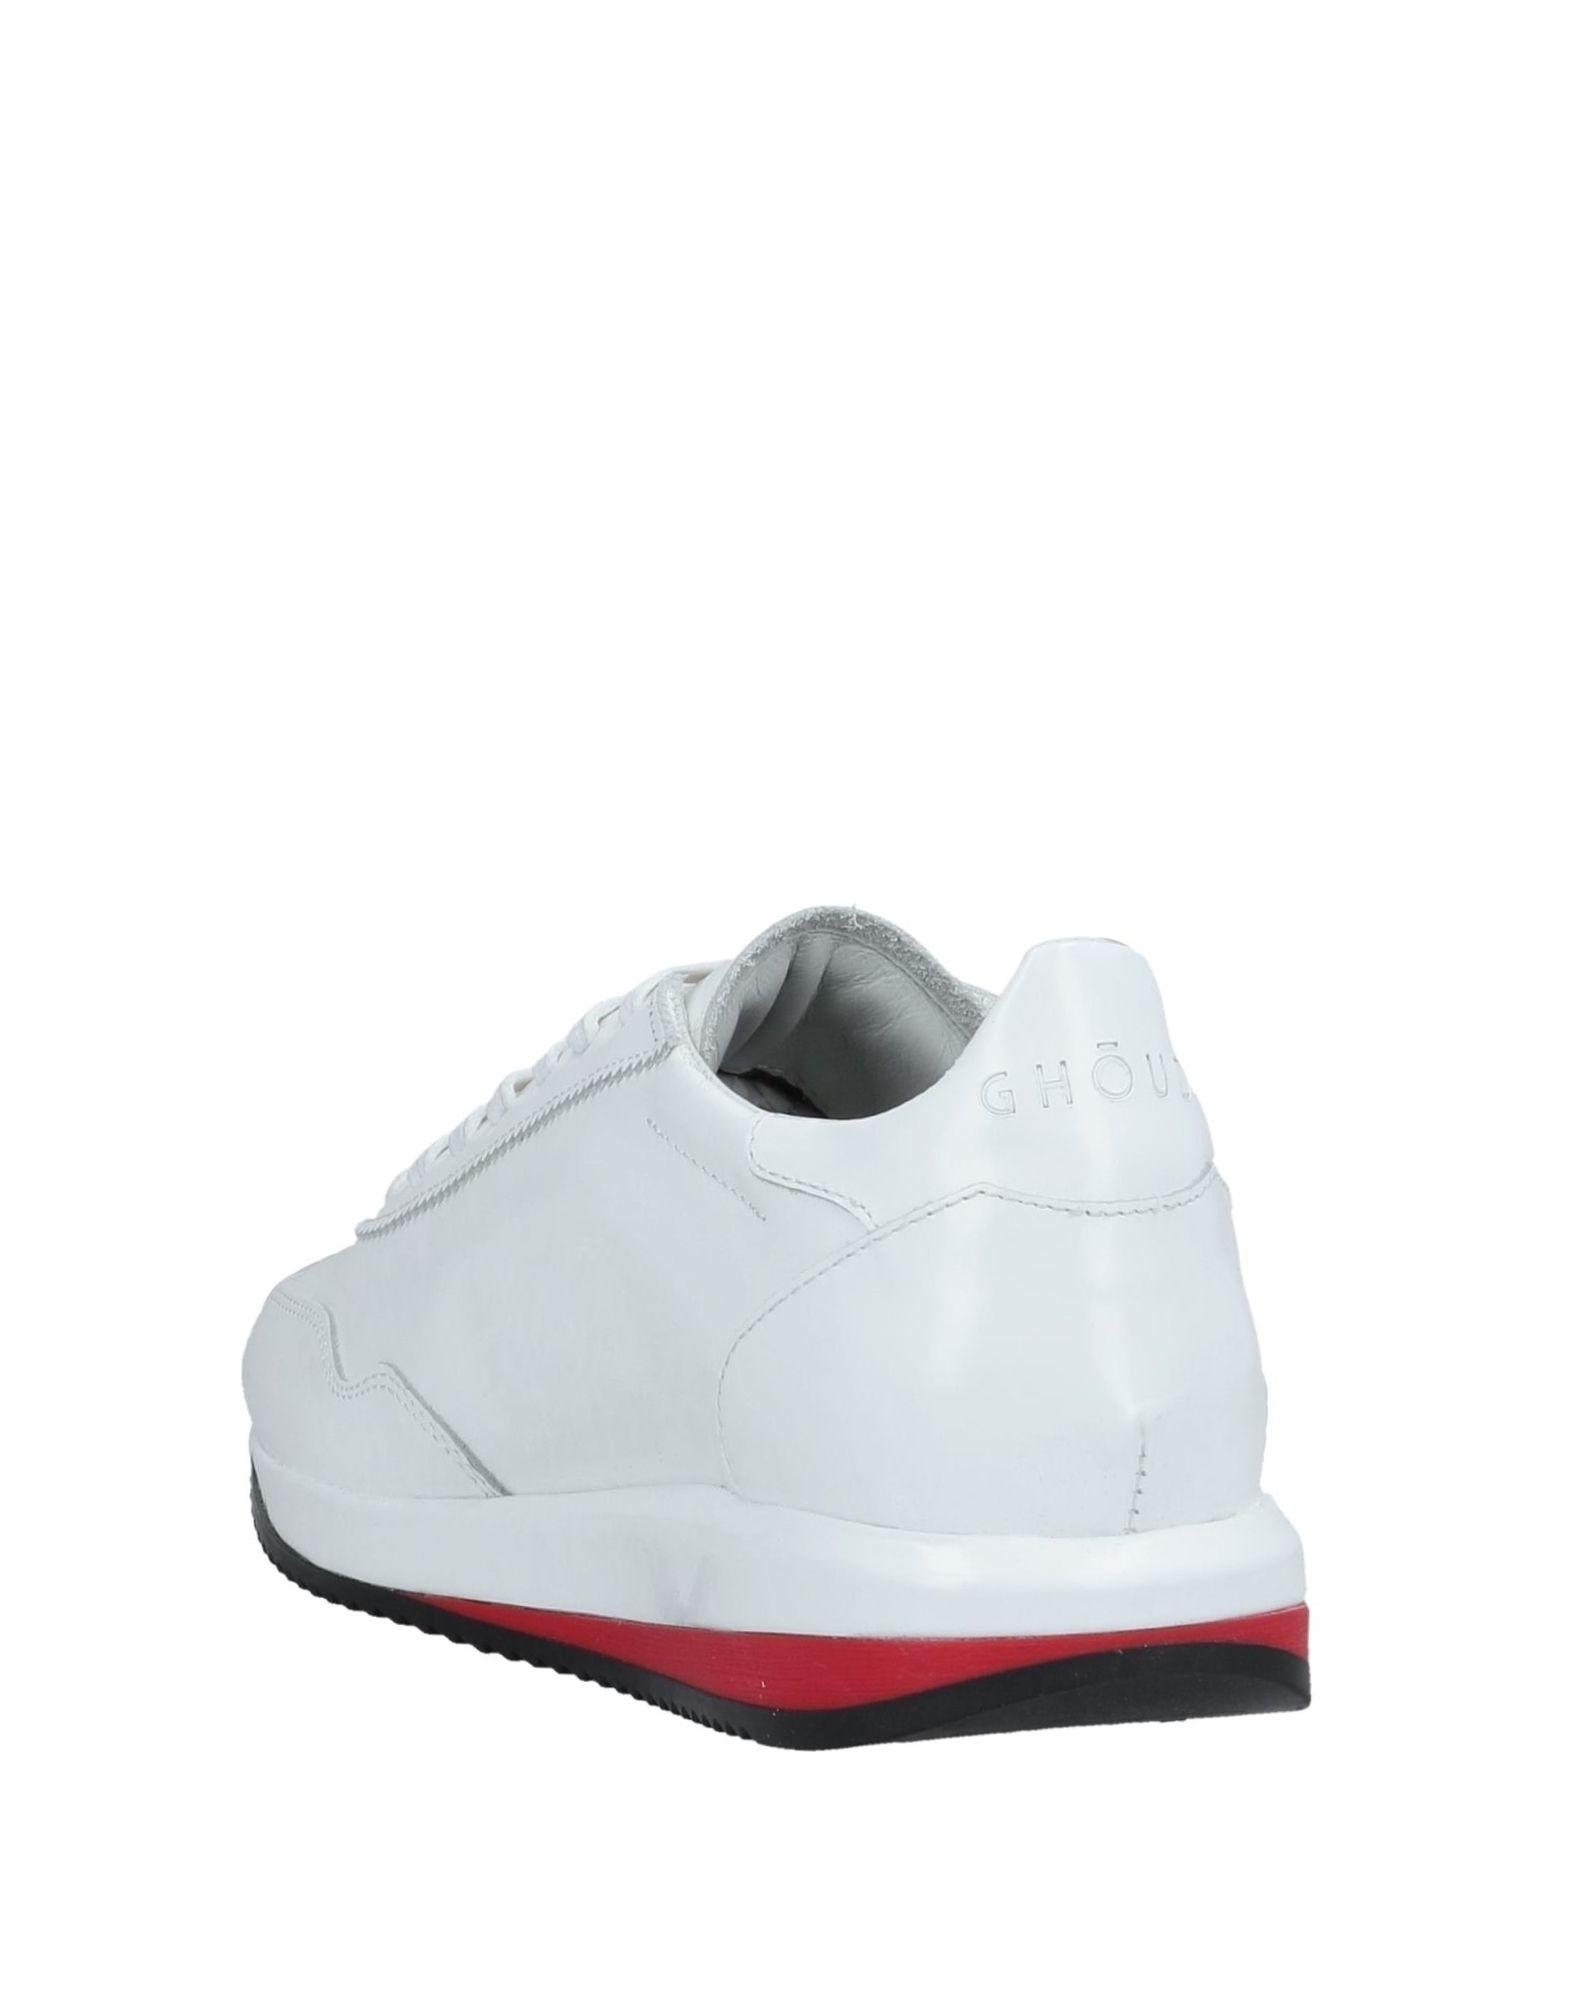 Ghōud Venice aussehende Sneakers Damen  11548886HLGut aussehende Venice strapazierfähige Schuhe 5a6eae